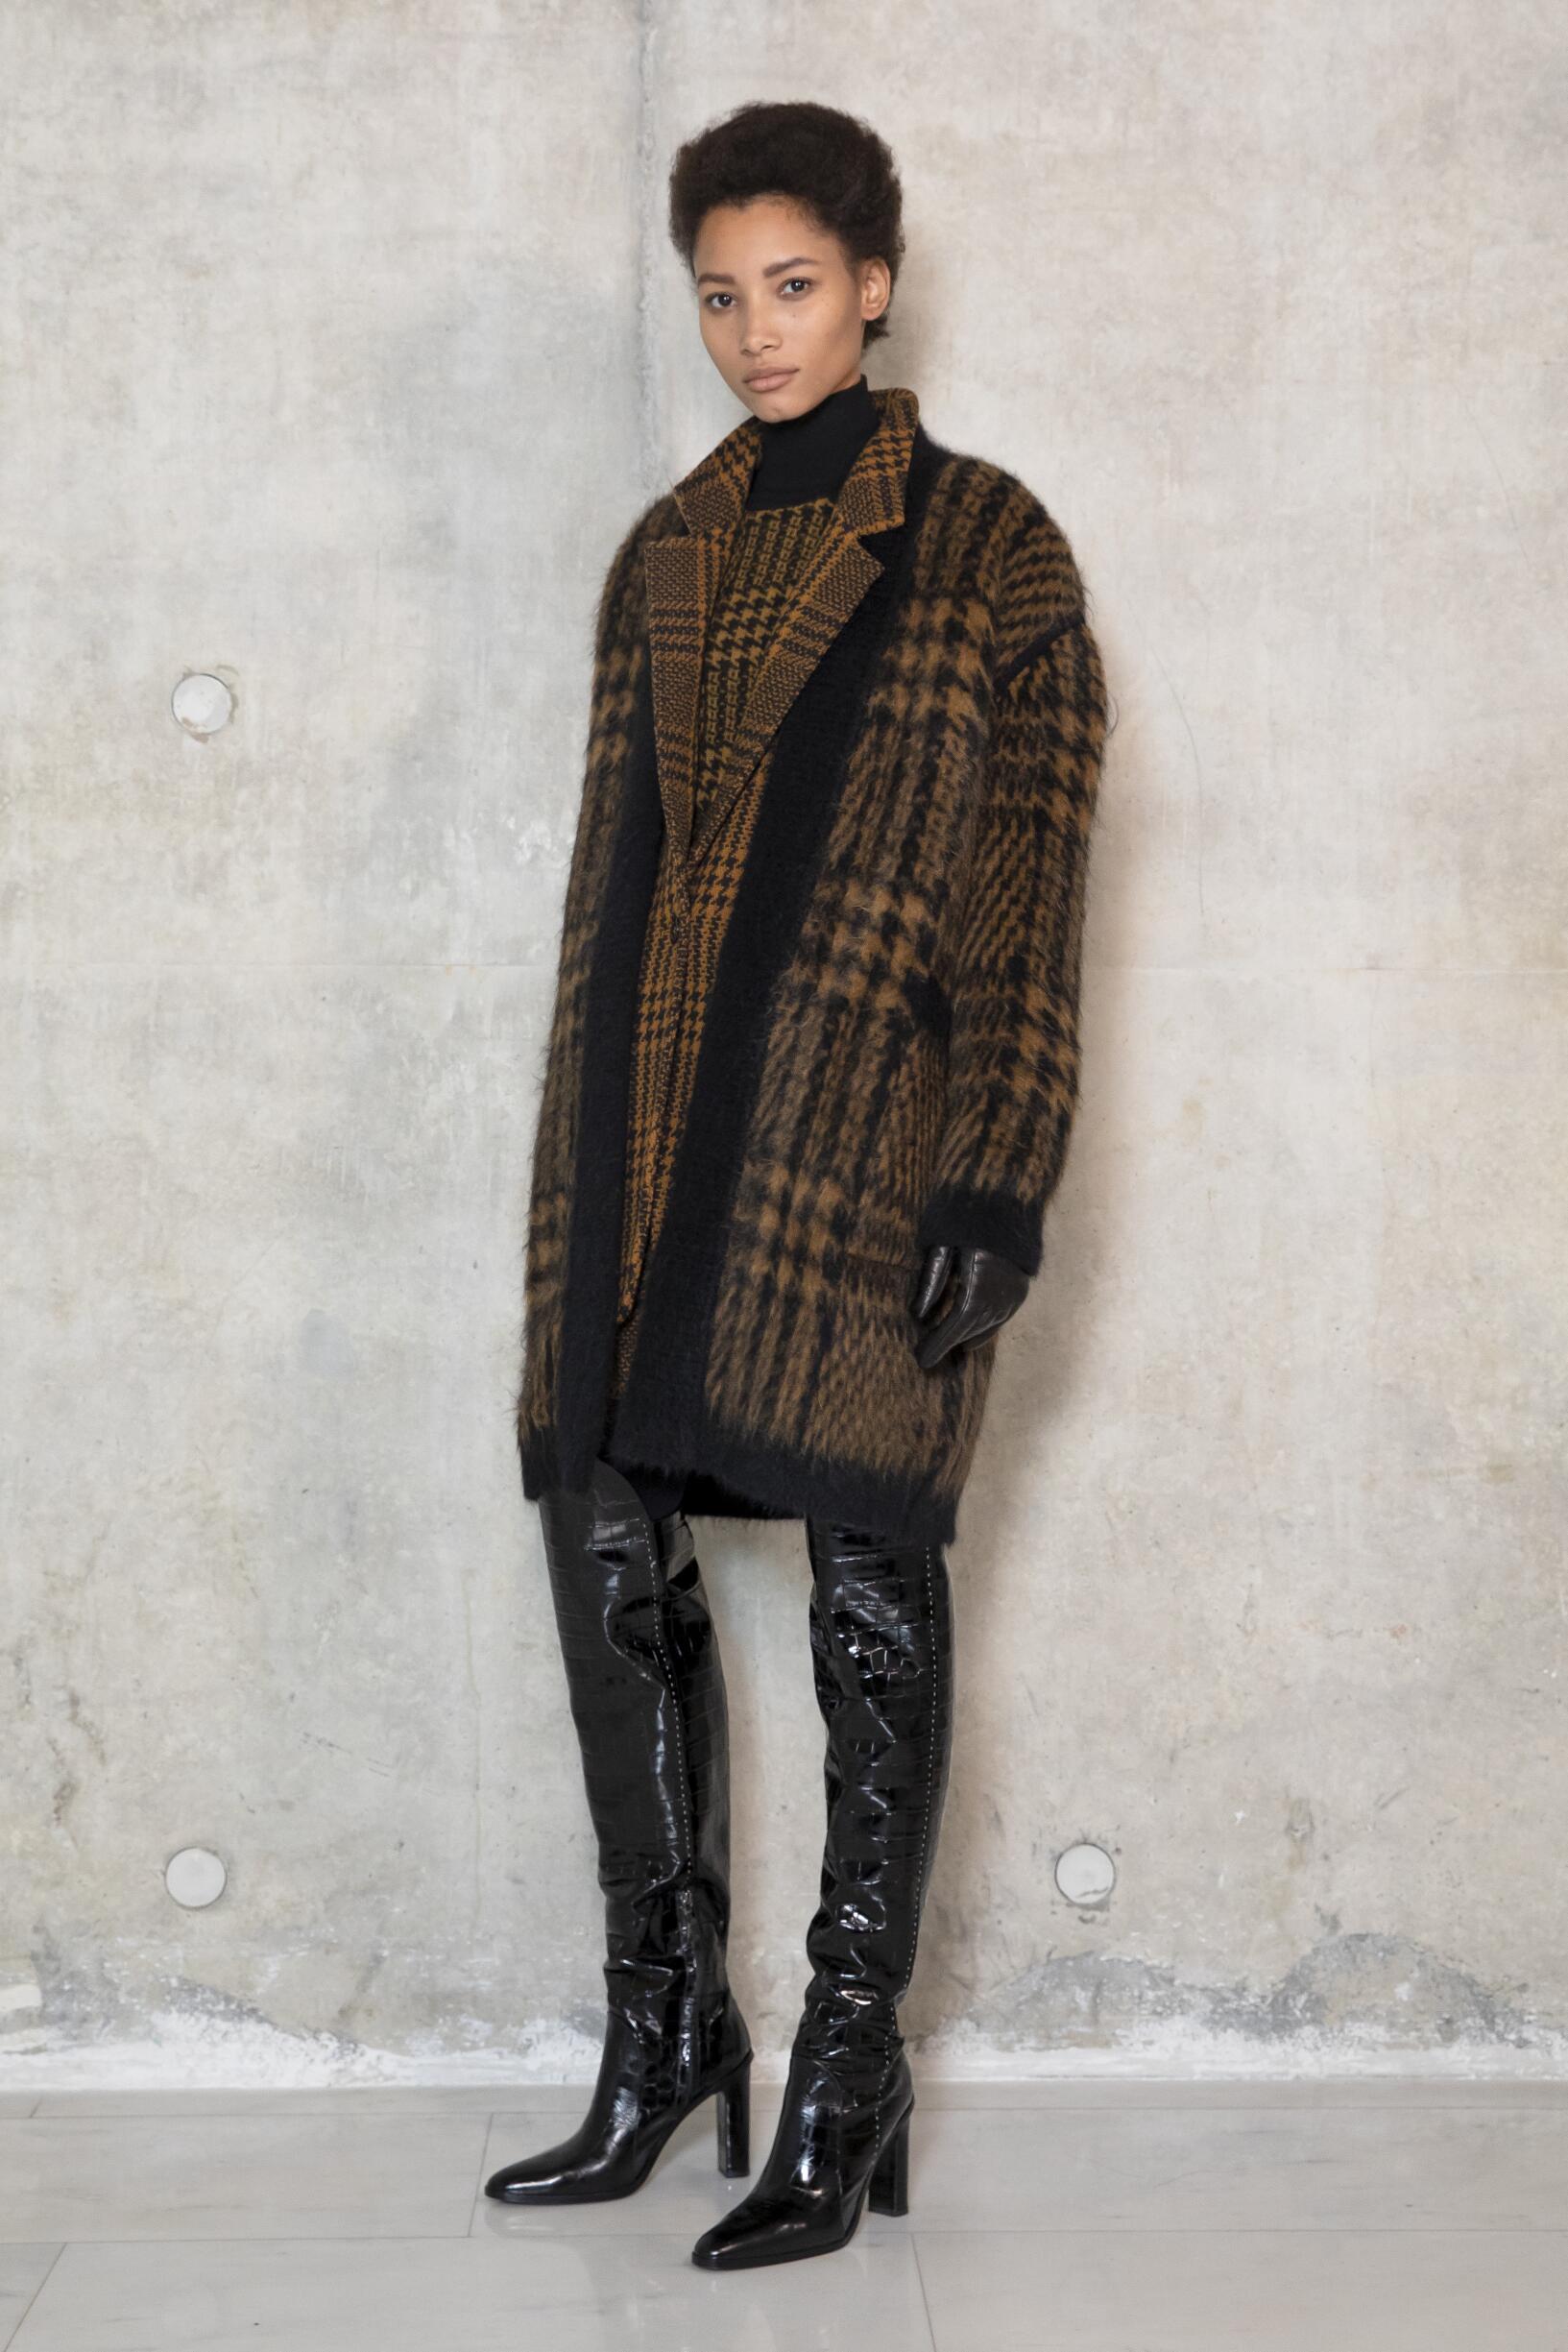 Backstage Max Mara Milan Fashion Week Model